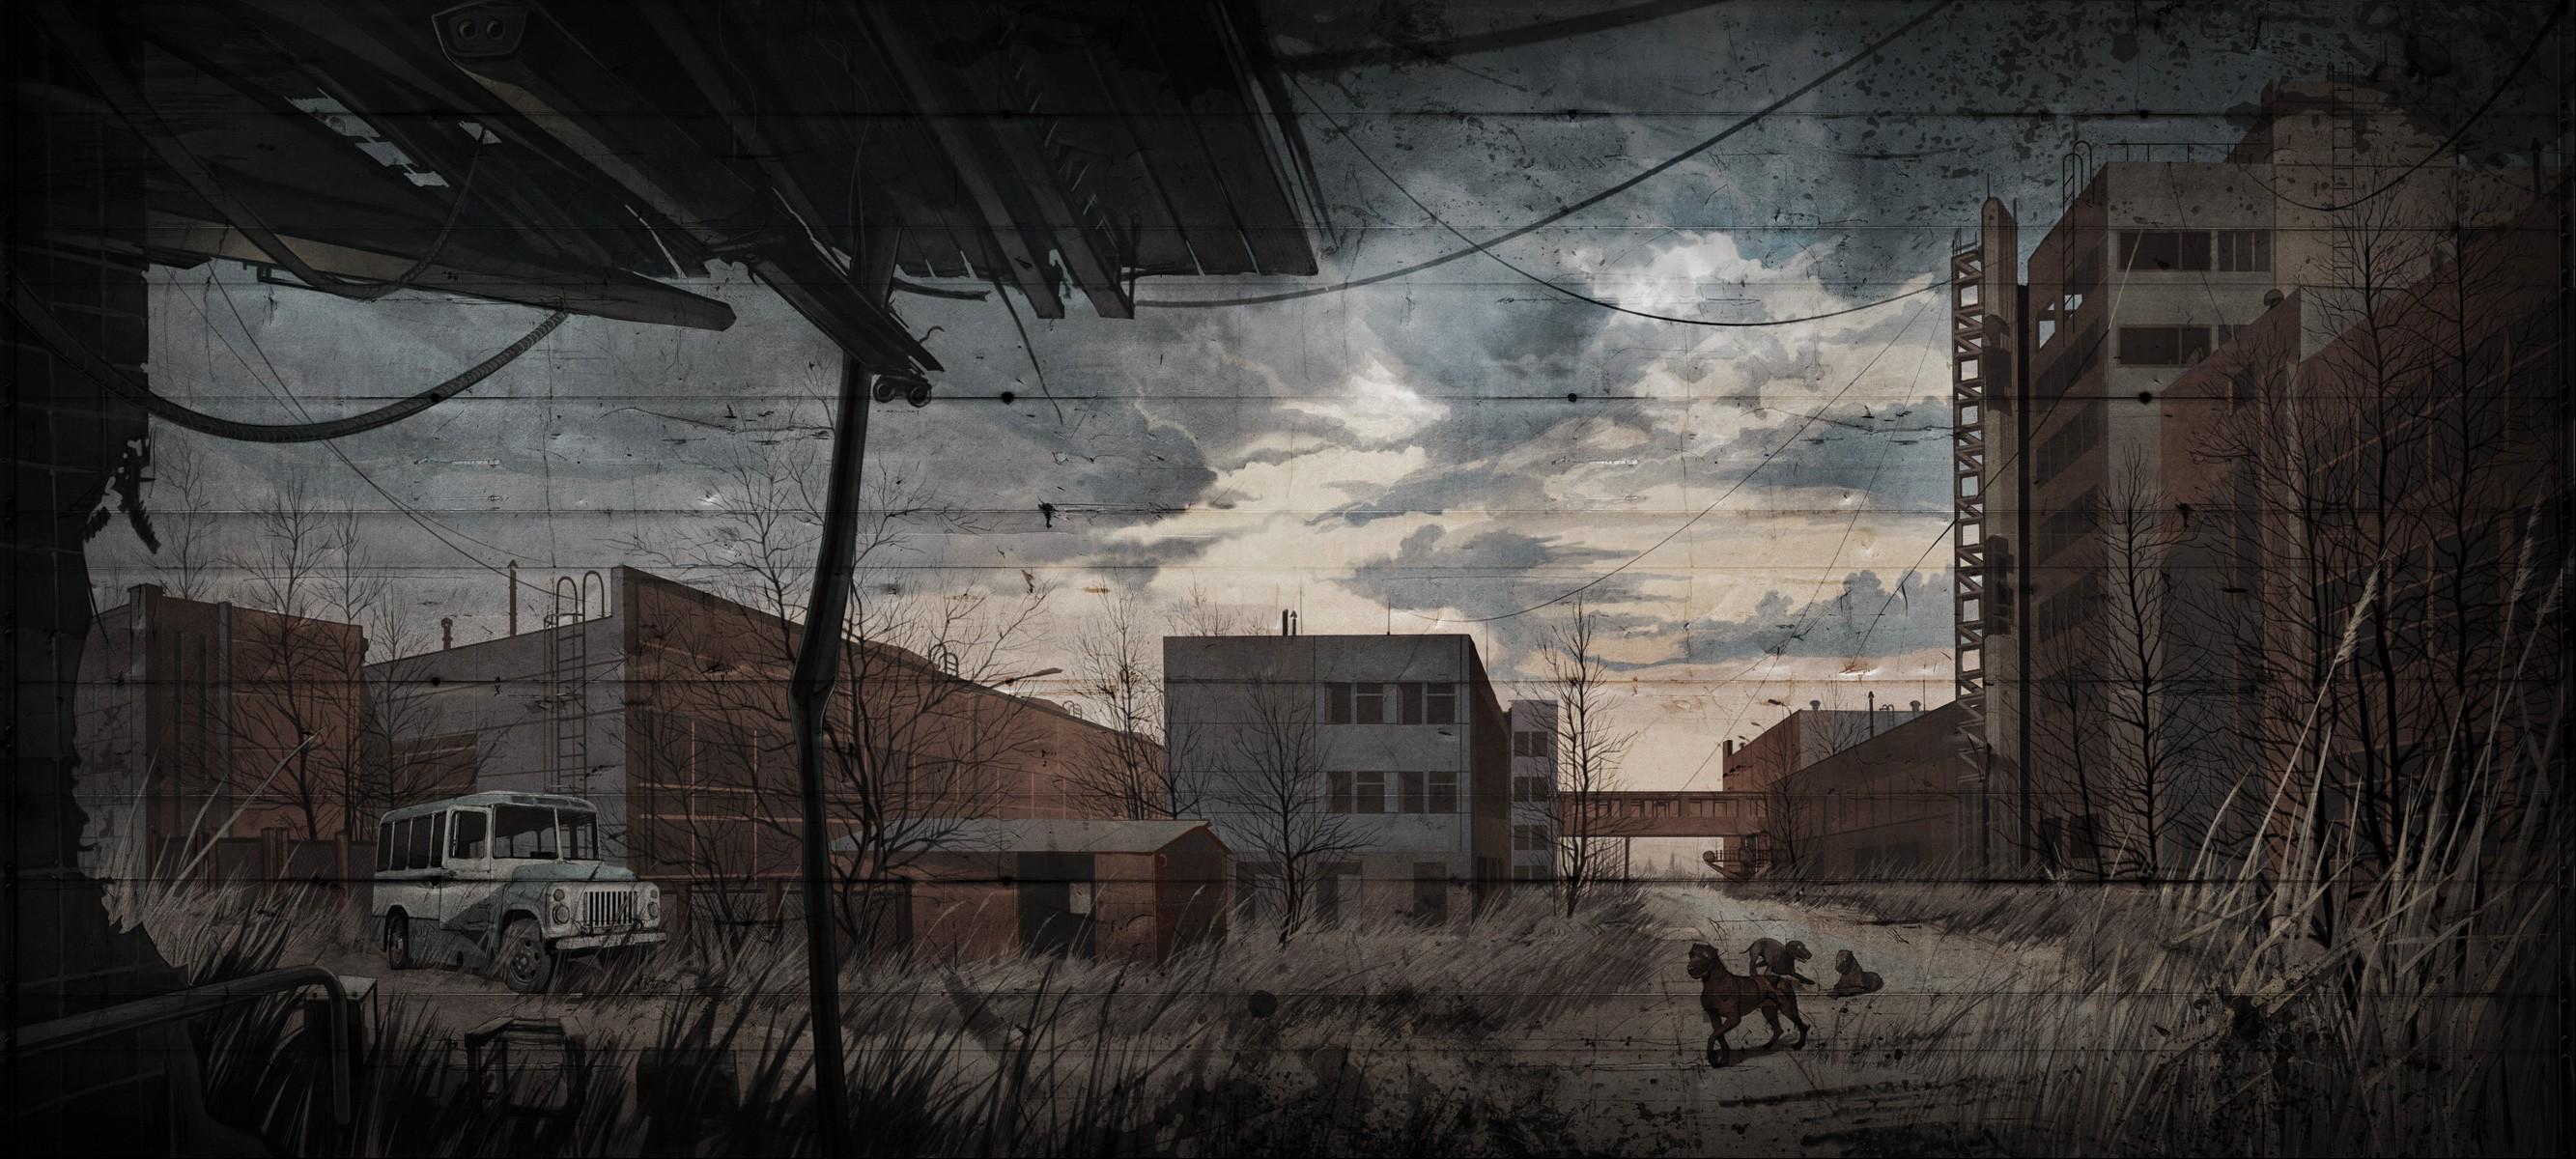 Wallpaper Texture Ukraine S T A L K E R Call Of Pripyat Art